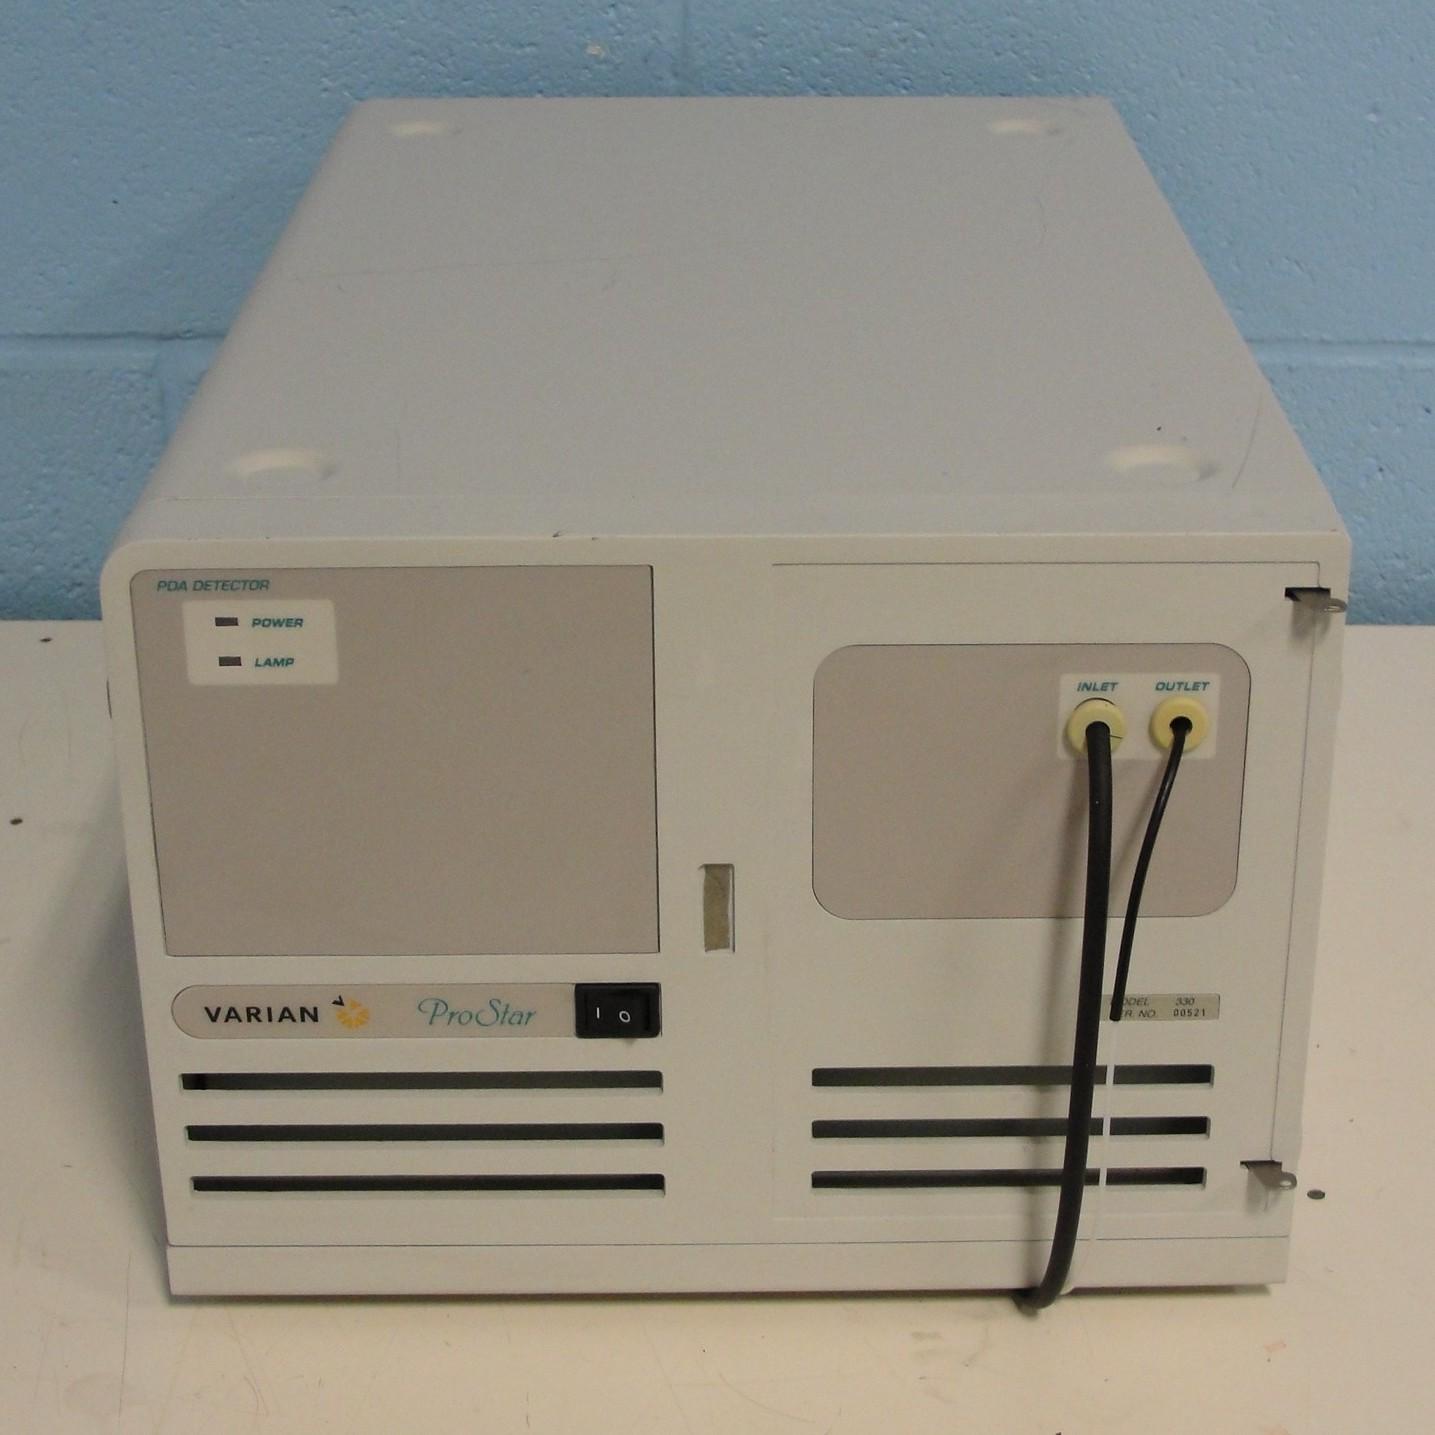 Varian ProStar 330 PDA Detector (Photodiode Array Detector) Image